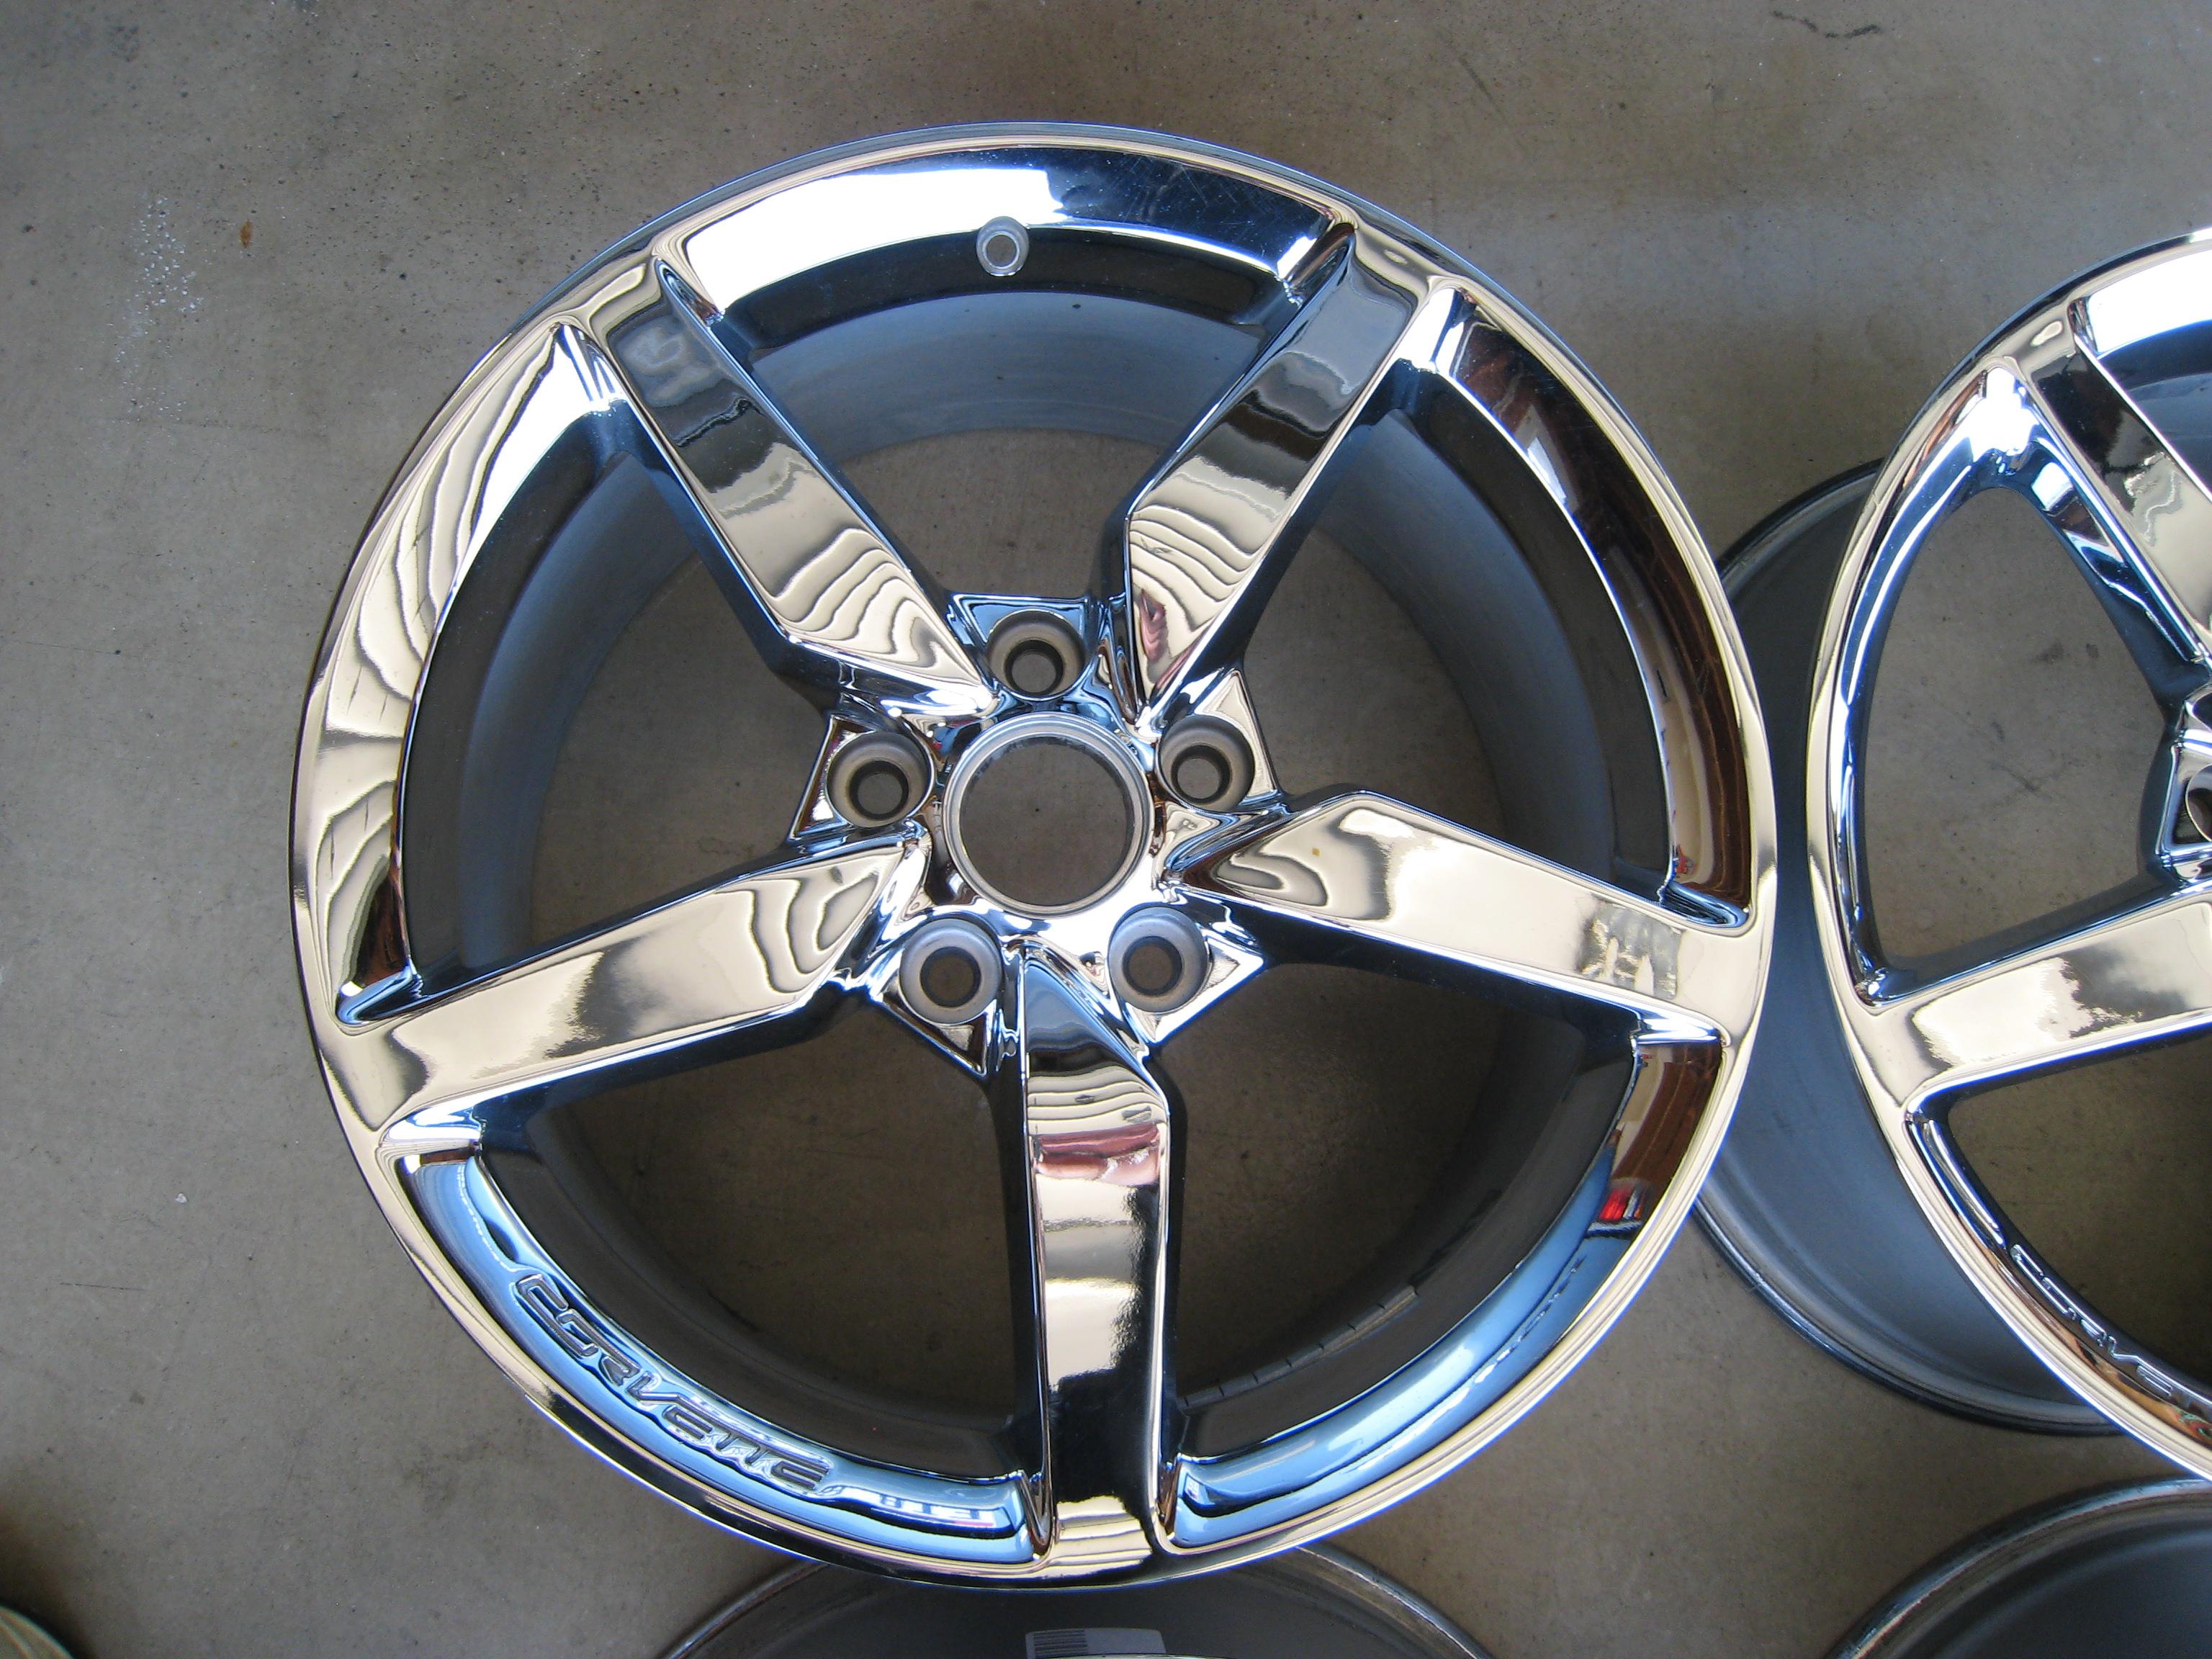 oem c7 chrome 5 spoke wheels for sale